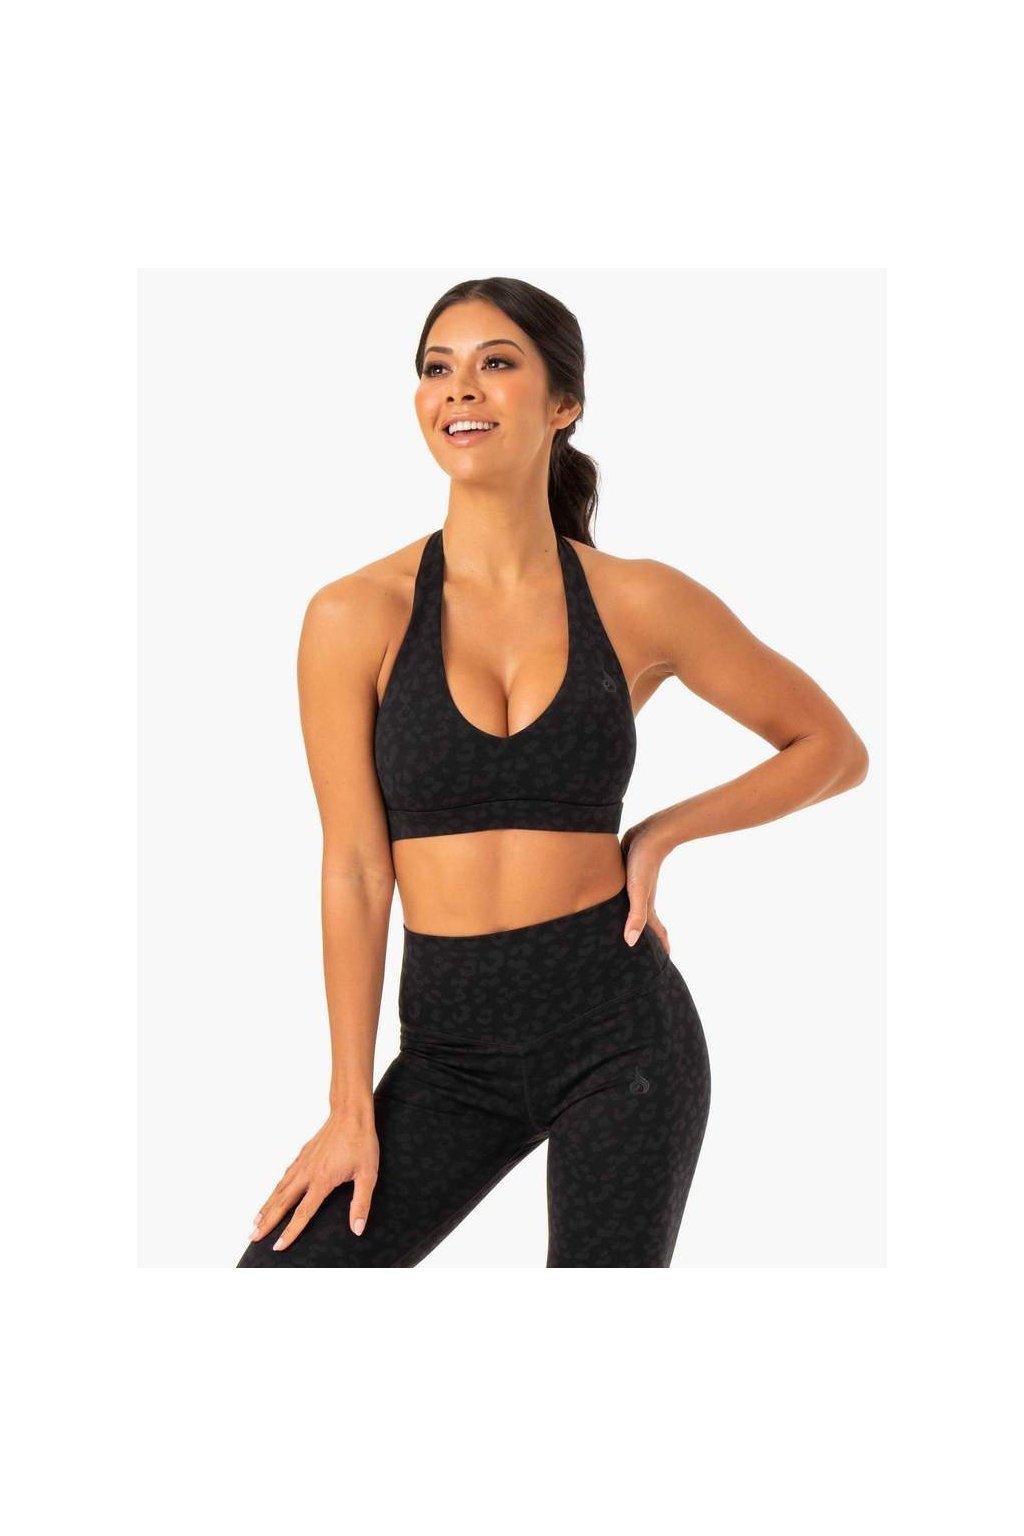 hybrid halter sports bra black leopard clothing ryderwear 702390 1000x1000